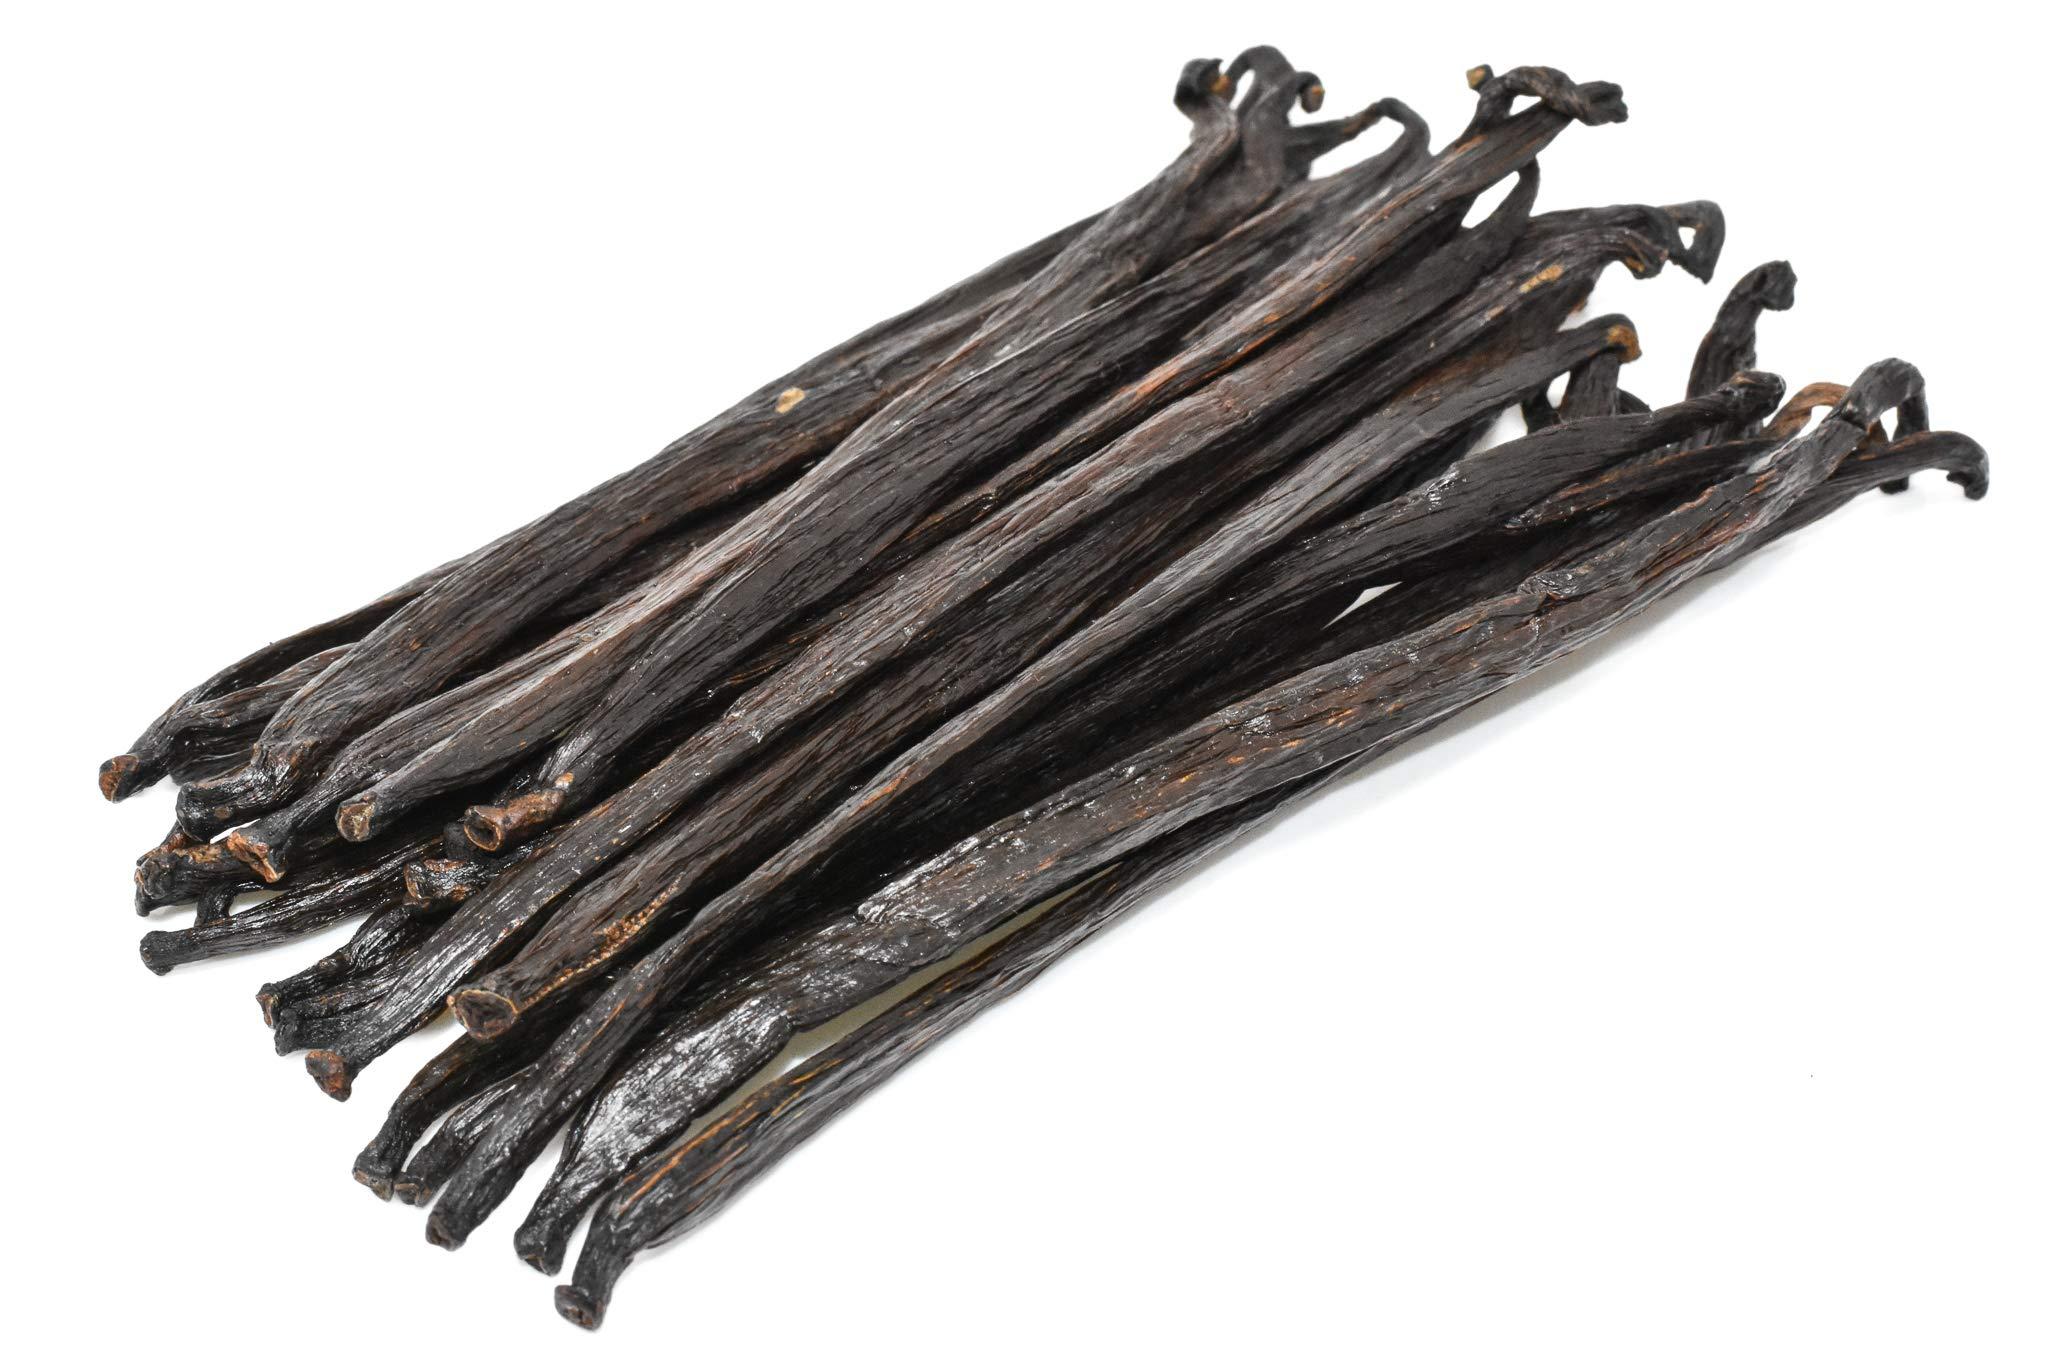 Extract Grade Vanilla Beans by Slofoodgroup 12-14 cm (various sizes available) Grade B Vanilla beans (4 oz/.25 extract Vanilla Beans)